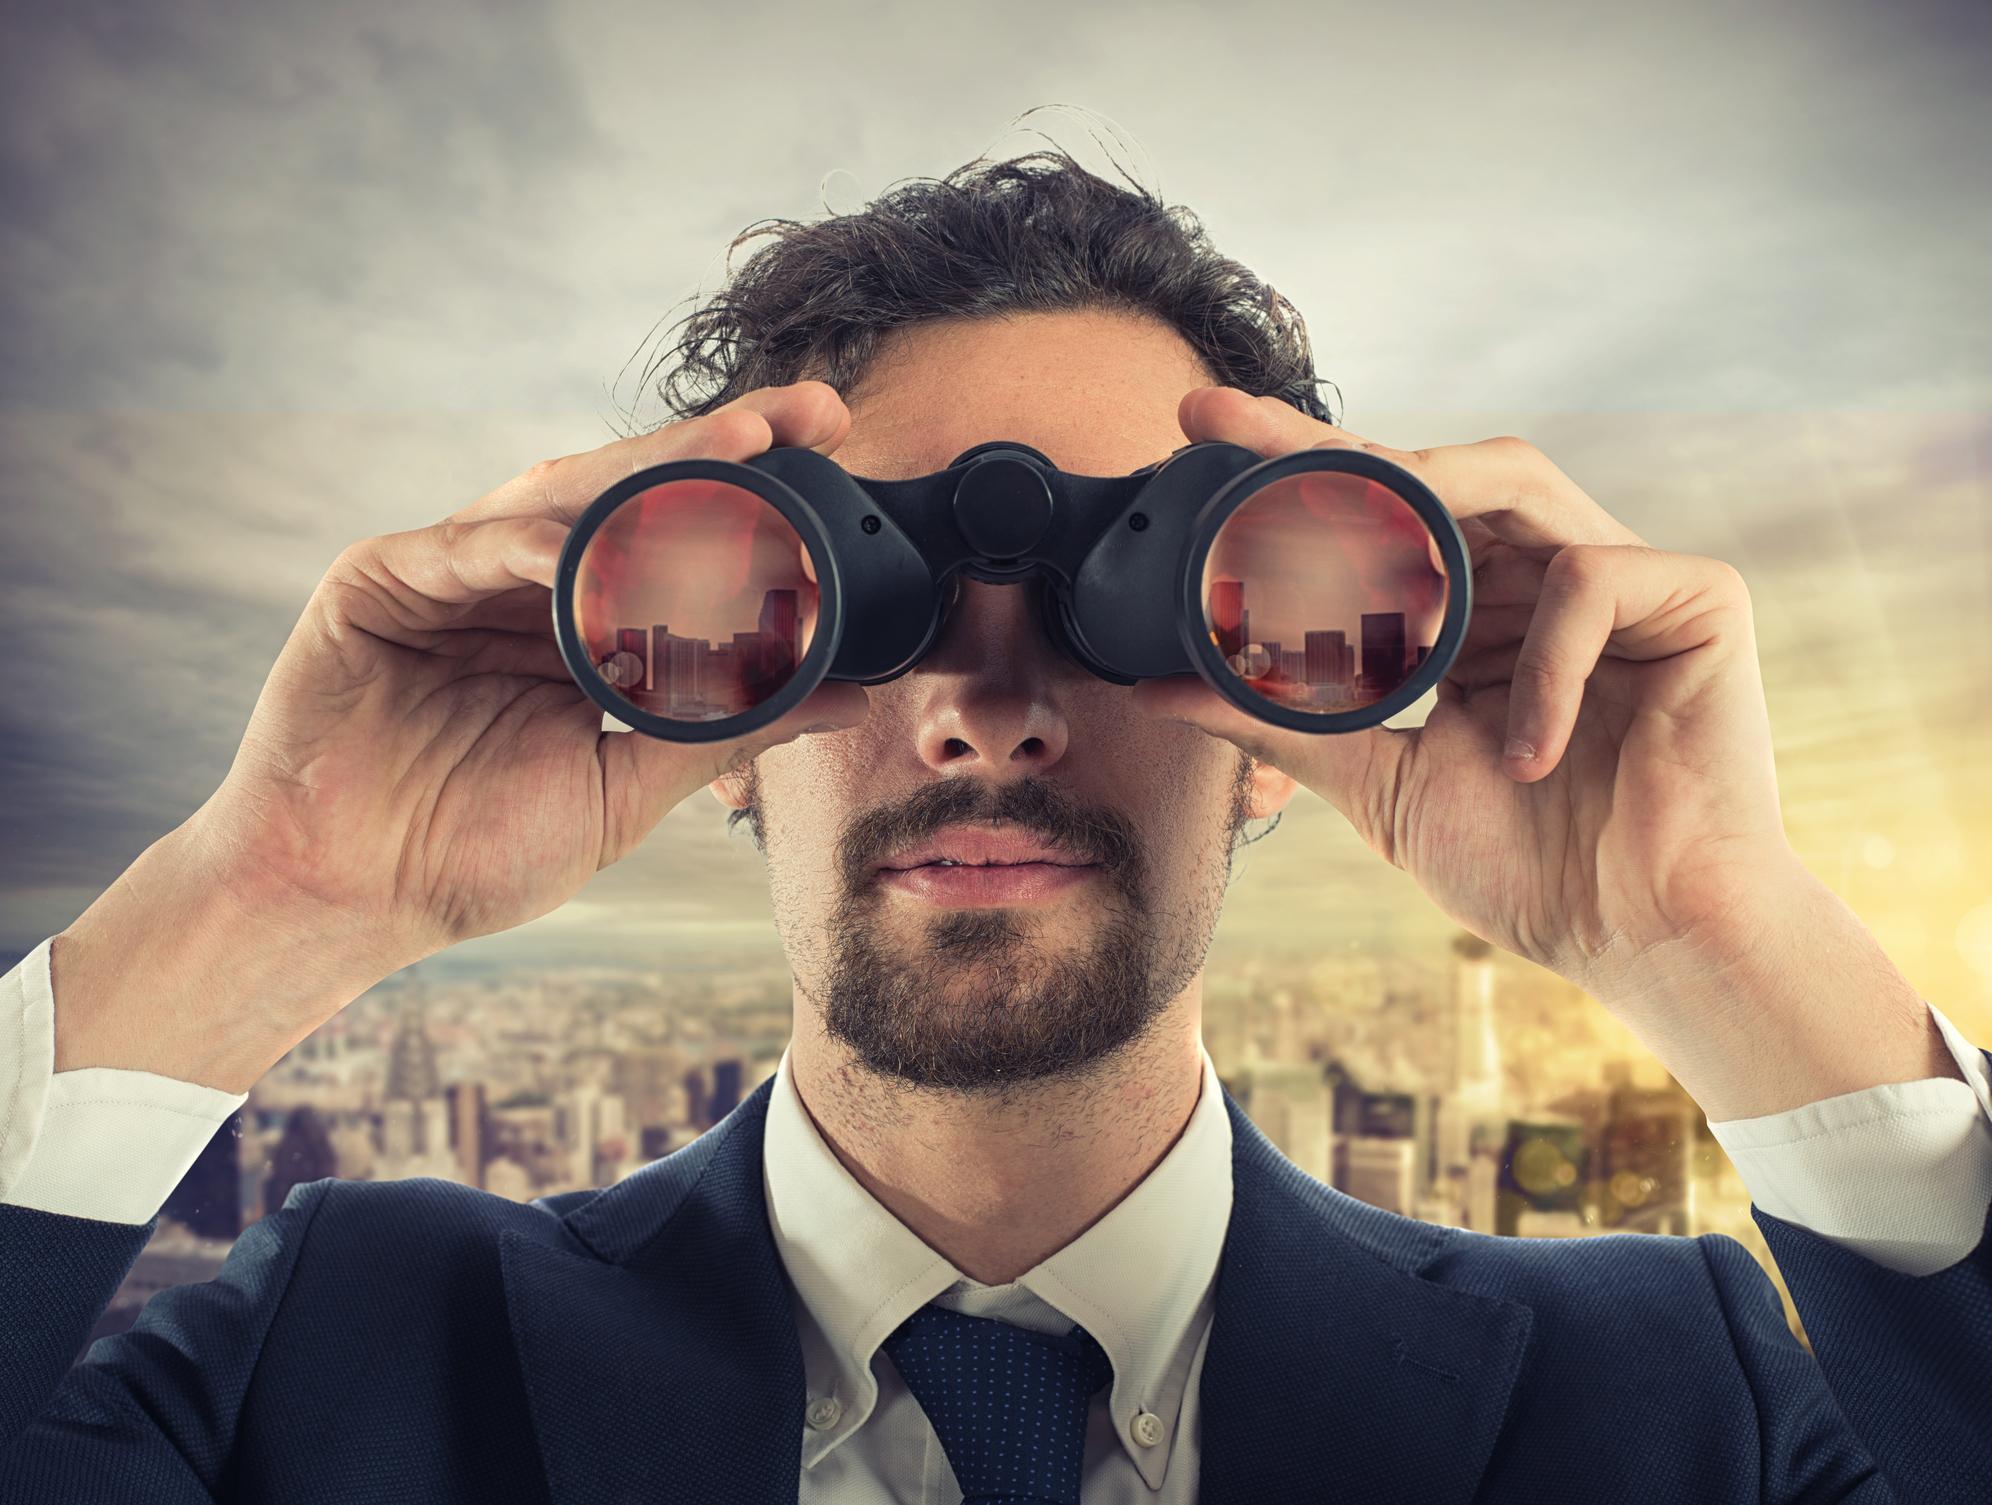 A man looking through binoculars.